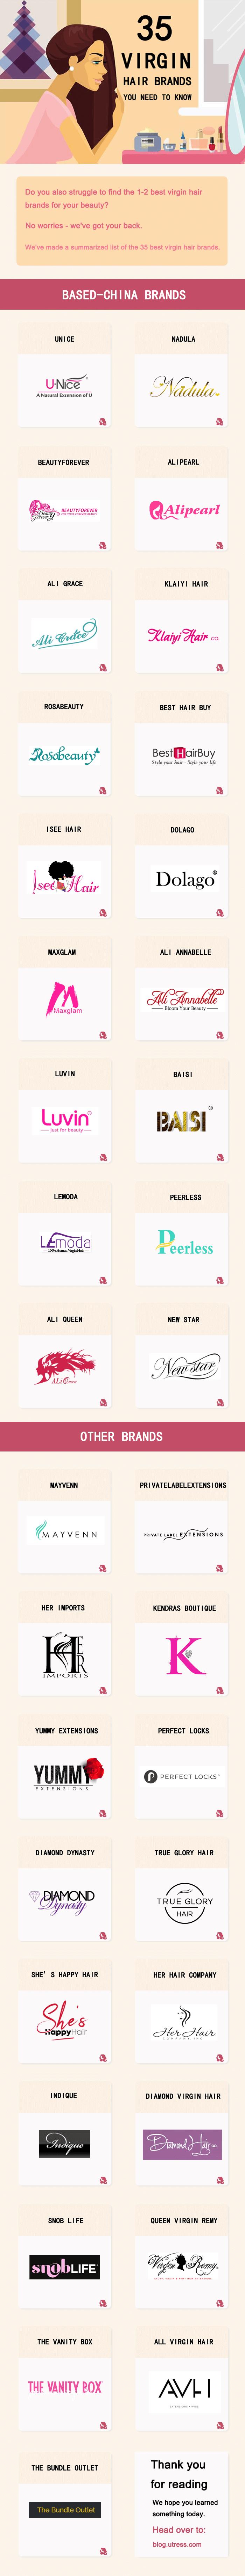 Best Virgin Hair Companies: The Complete List (Updated 2019)